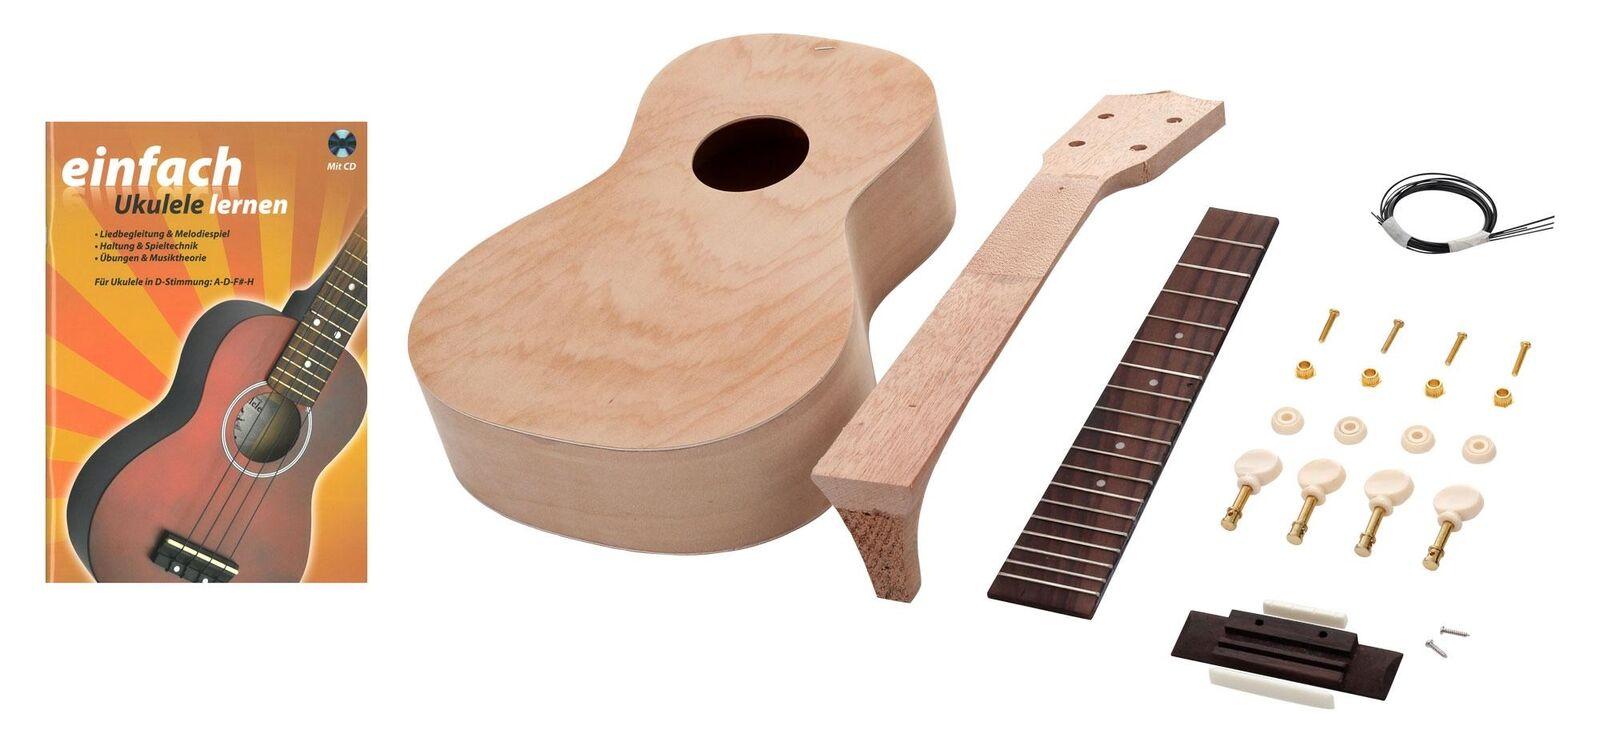 Ukulele Bausatz Konzert selber bauen Do It Yourself Set DIY Kit Ukulelenschule